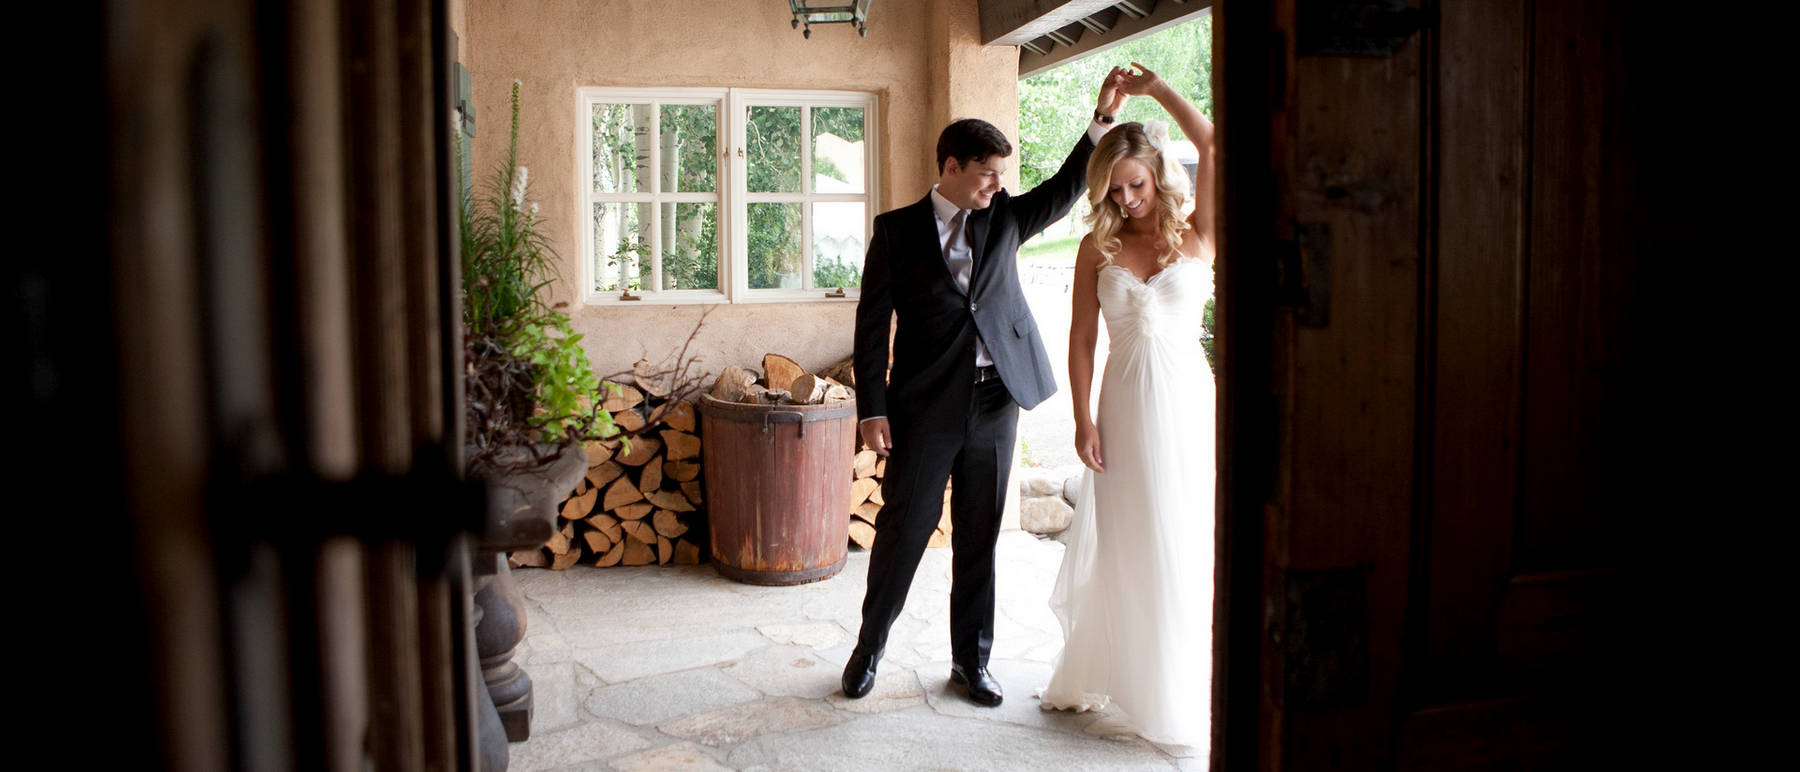 johnandjoseph-wedding-photographer-hz-slider-132